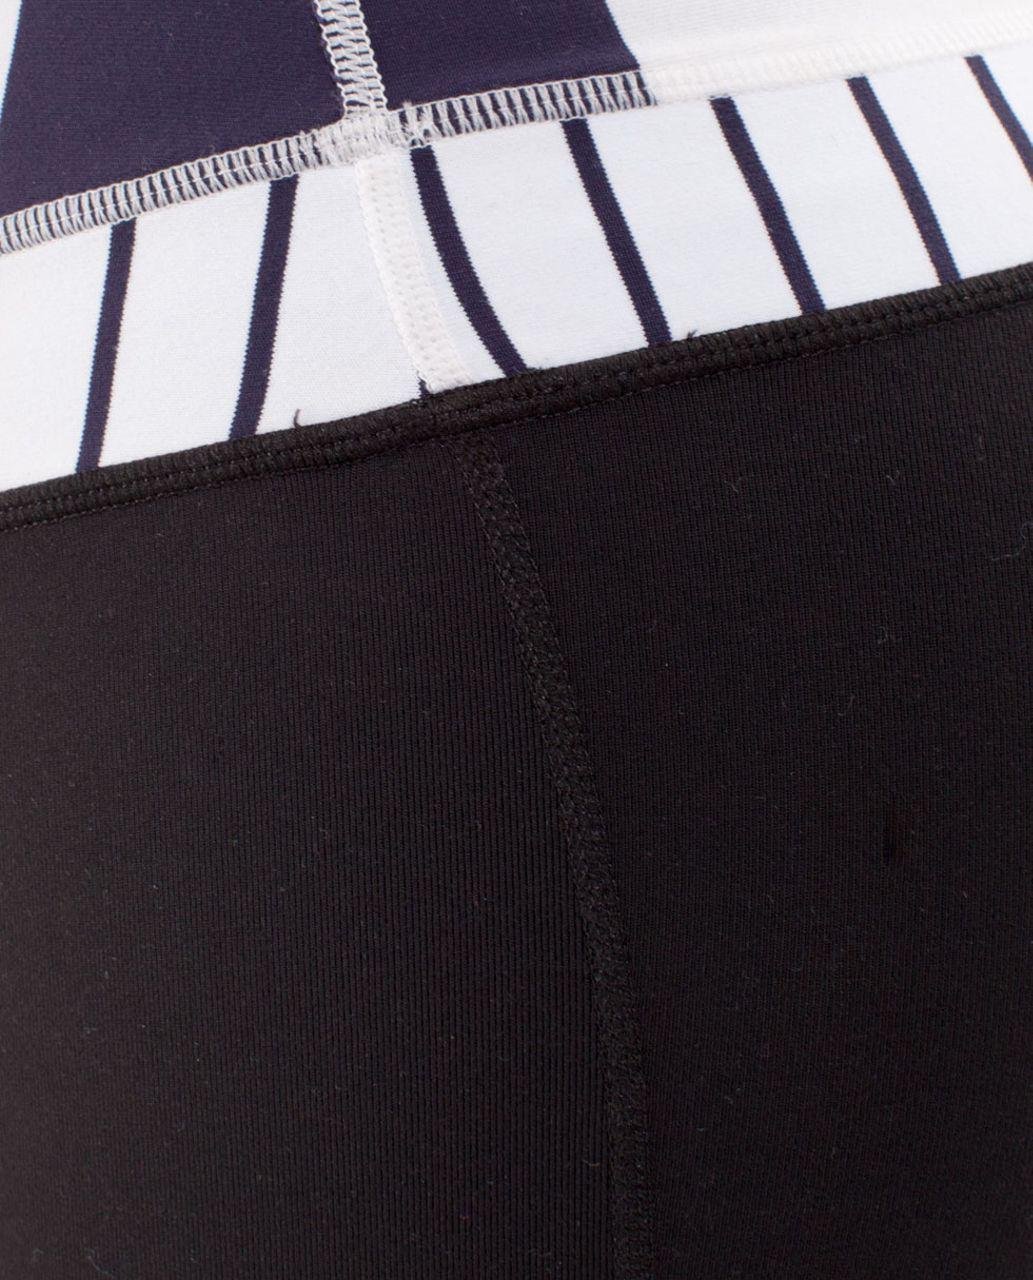 Lululemon Groove Crop - Black /  Wide Bold Stripe White Deep Indigo /  Quiet Stripe White Deep Indigo